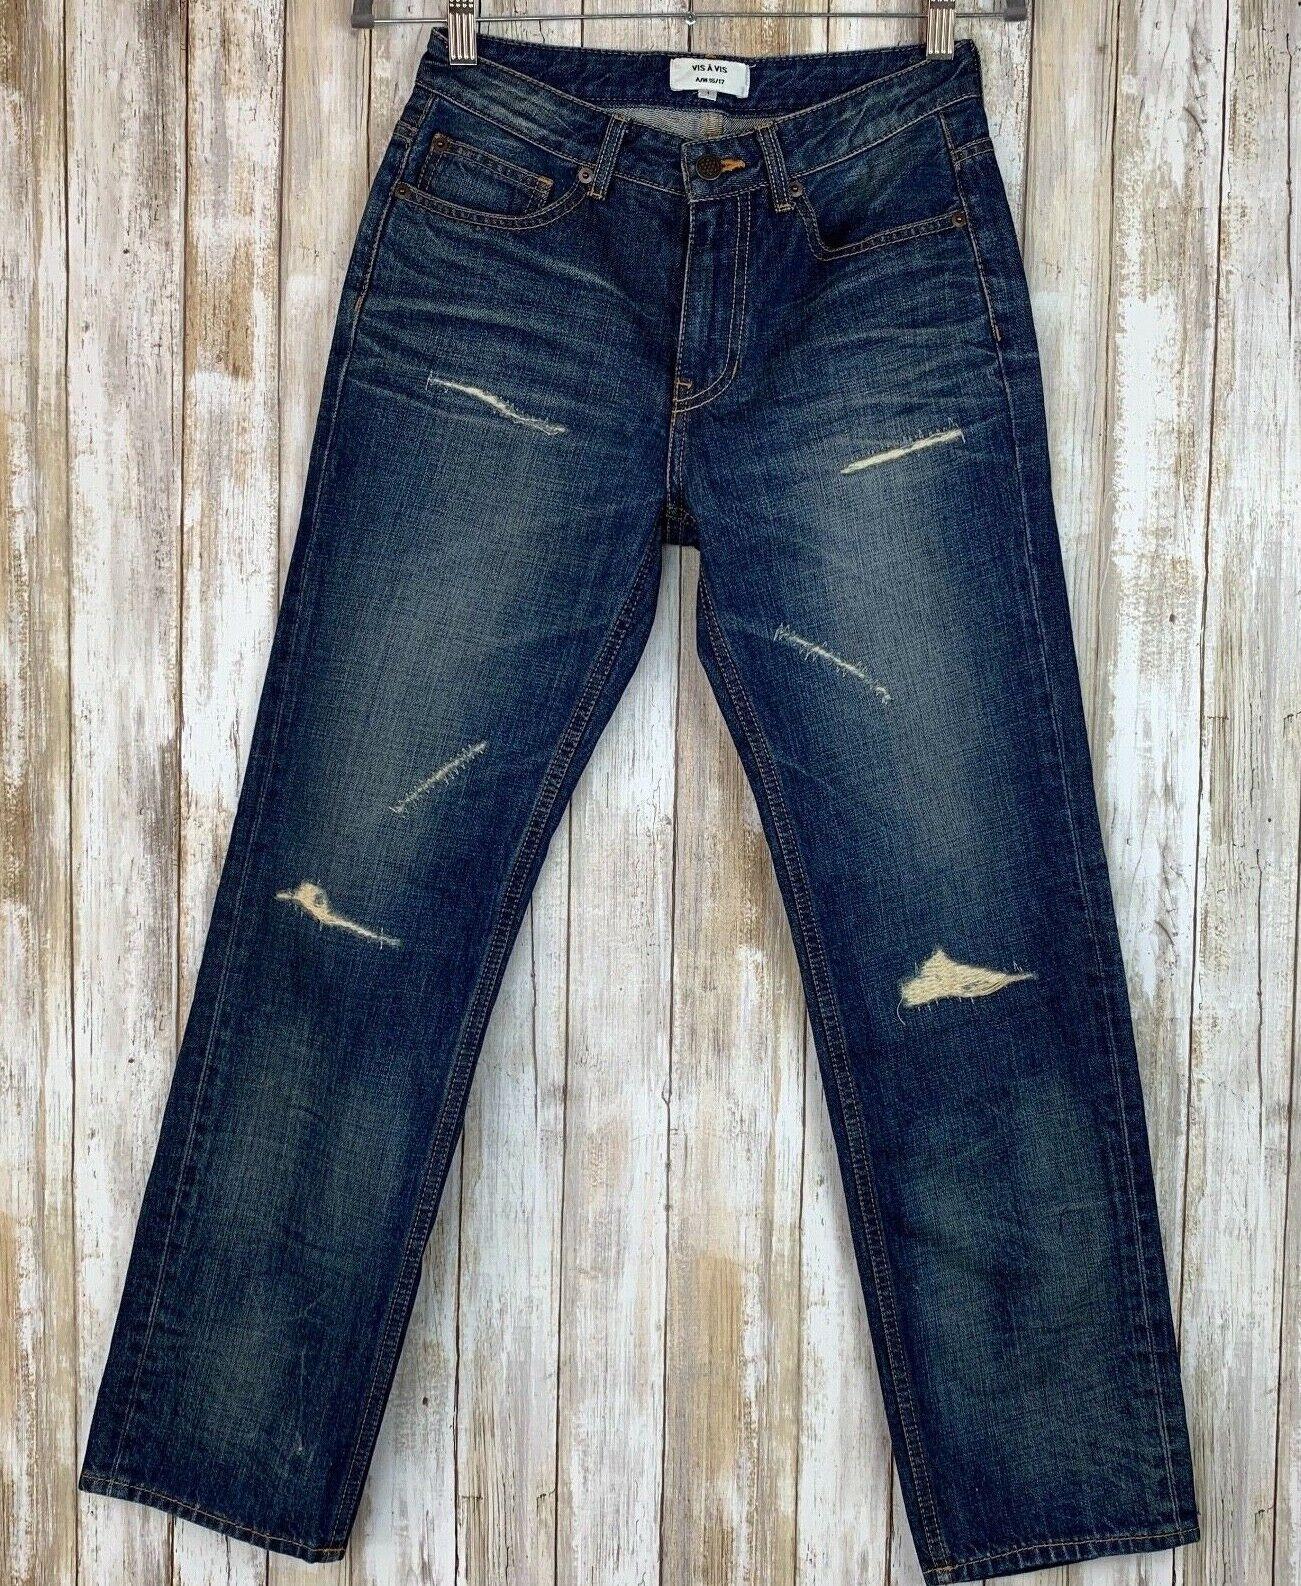 Vis A Vis Distressed bluee Denim Jeans Fall Winter Barneys Korea 1 25 26